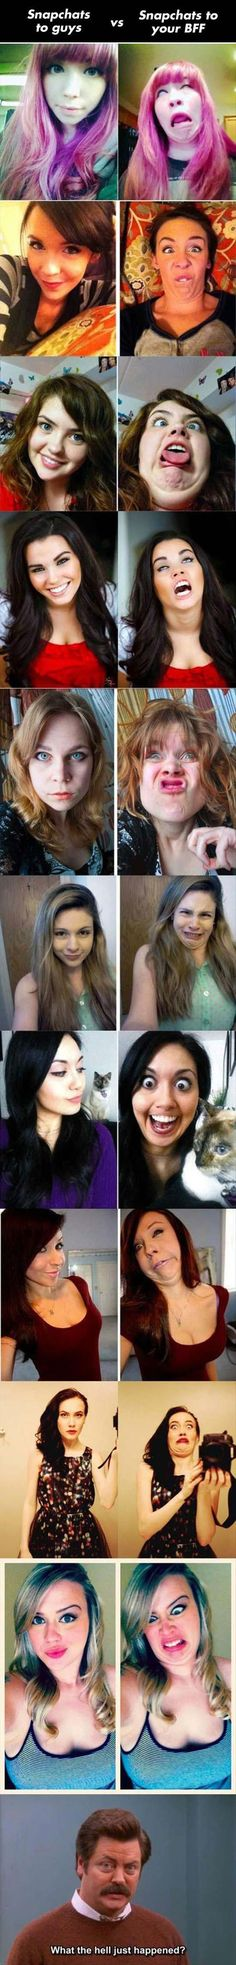 Snapchats guys vs bff